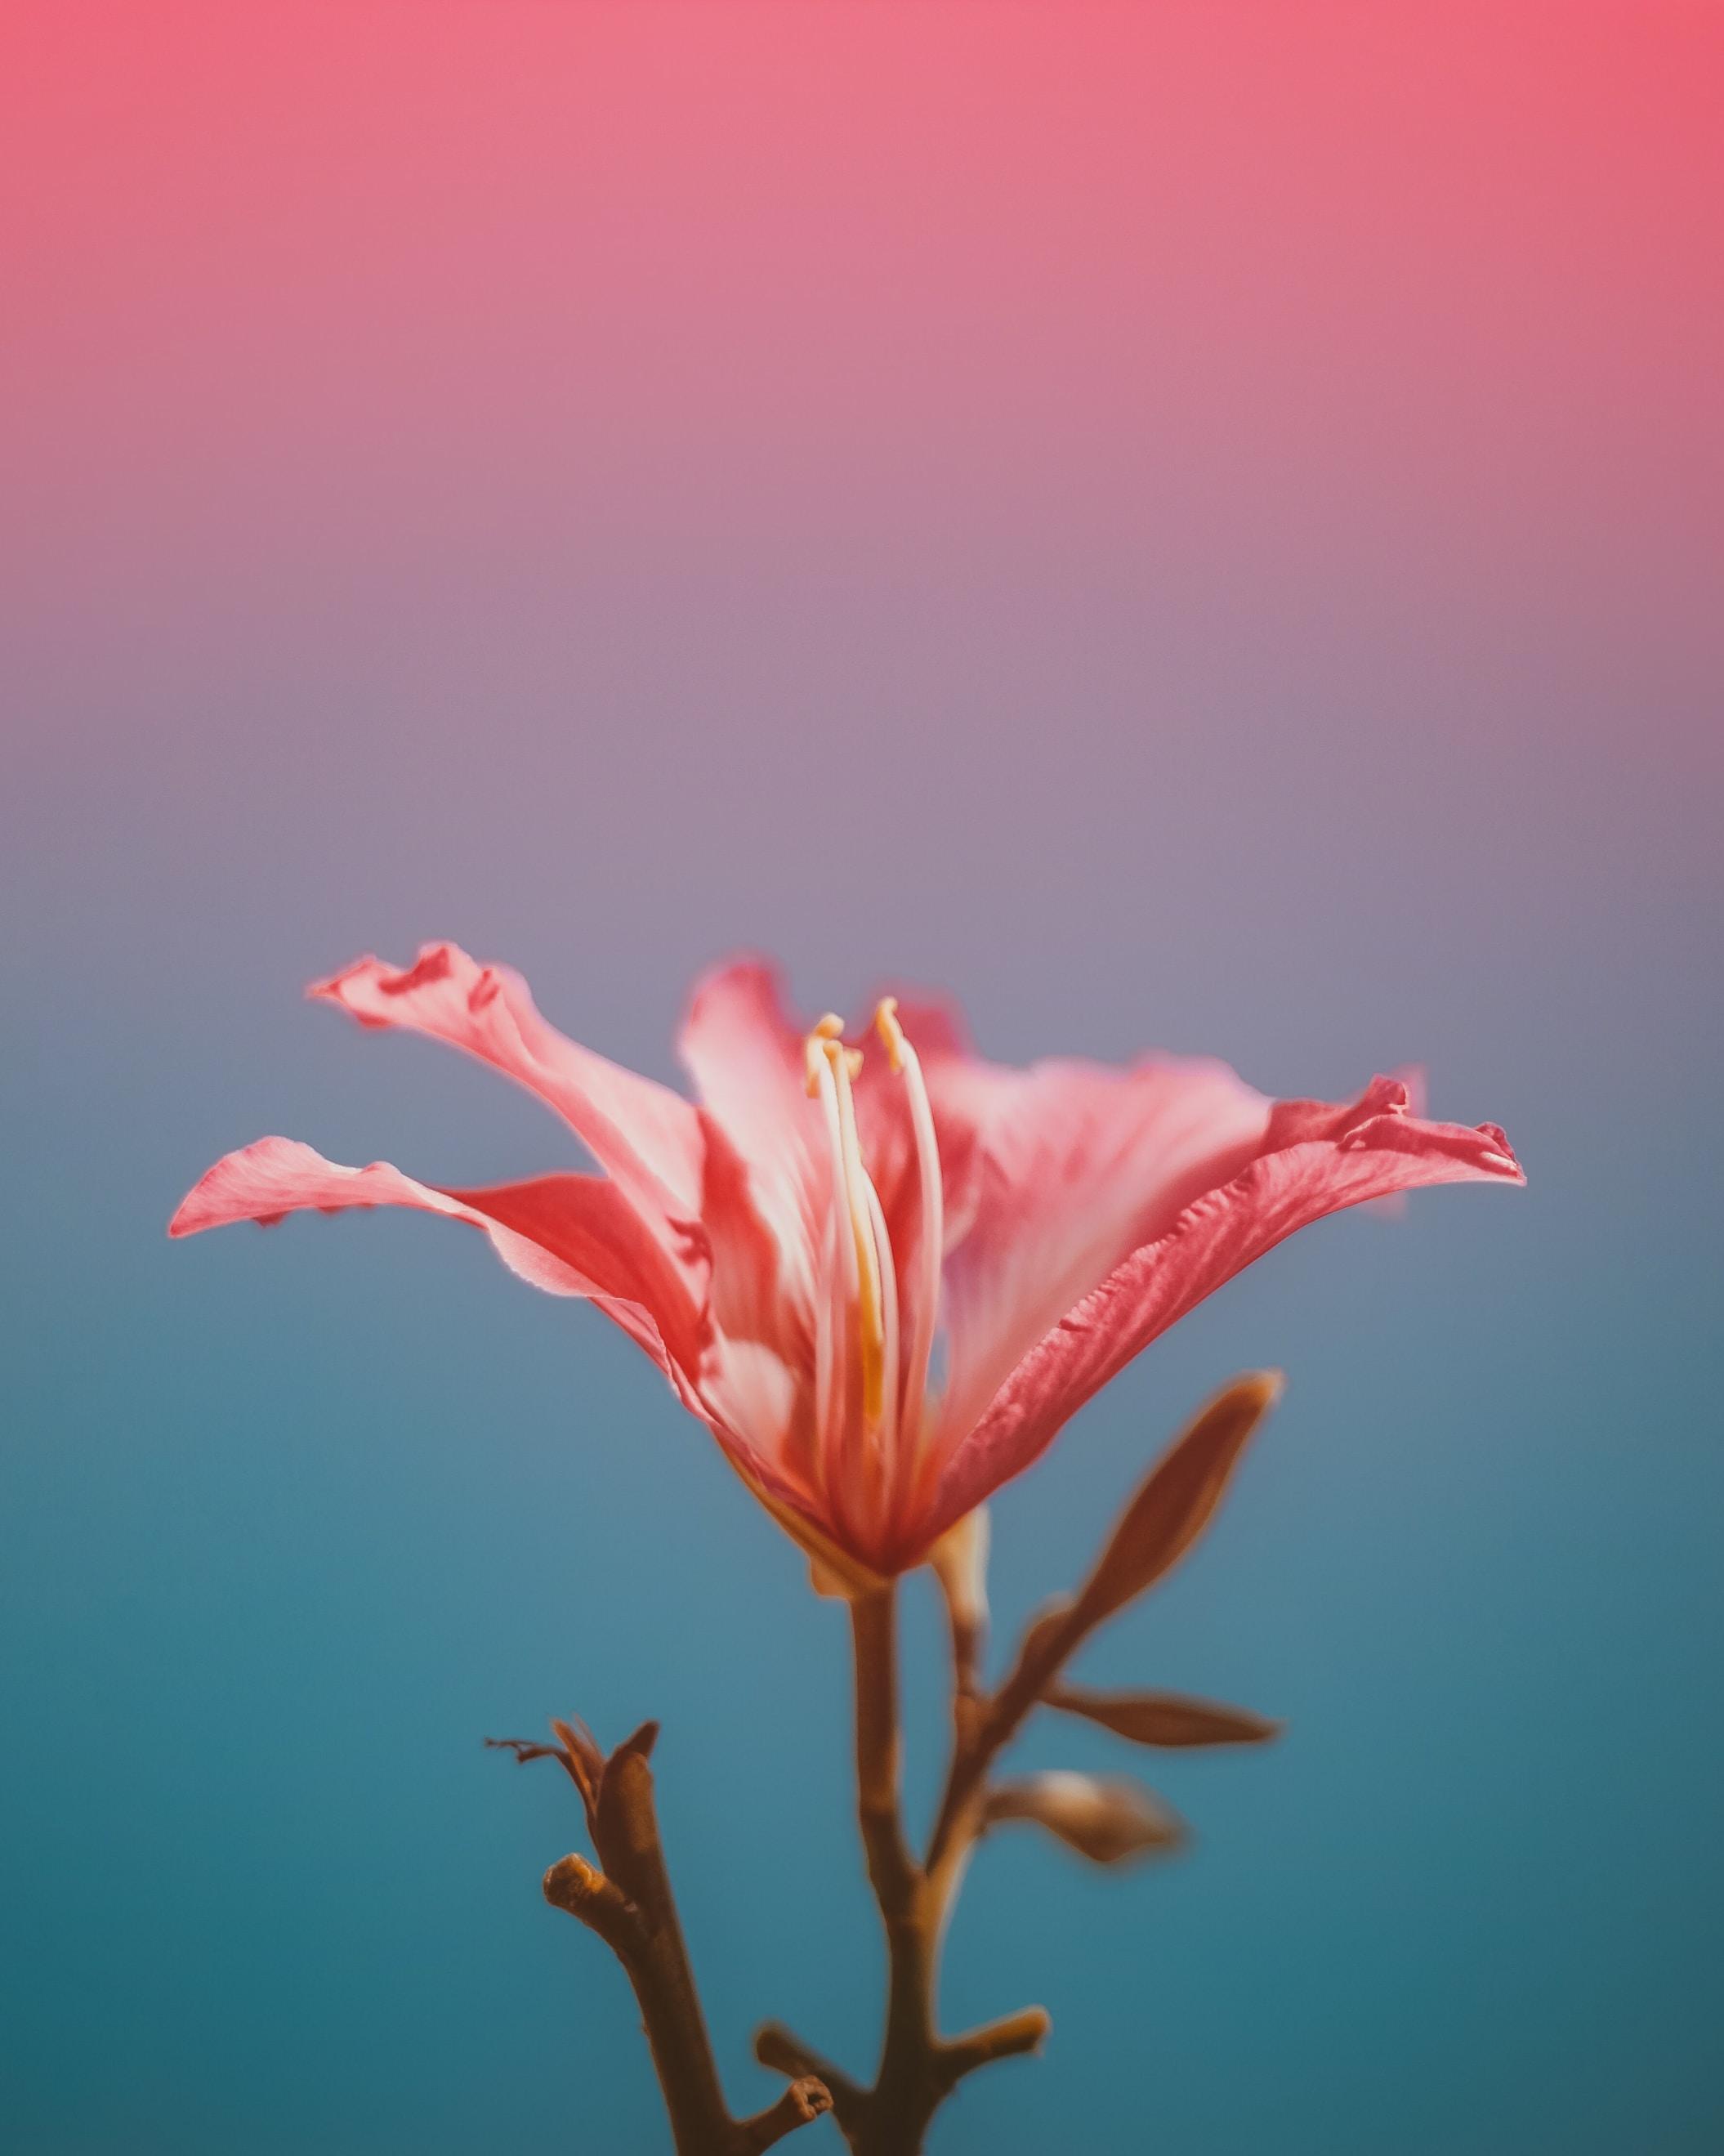 pink flower closeup photo